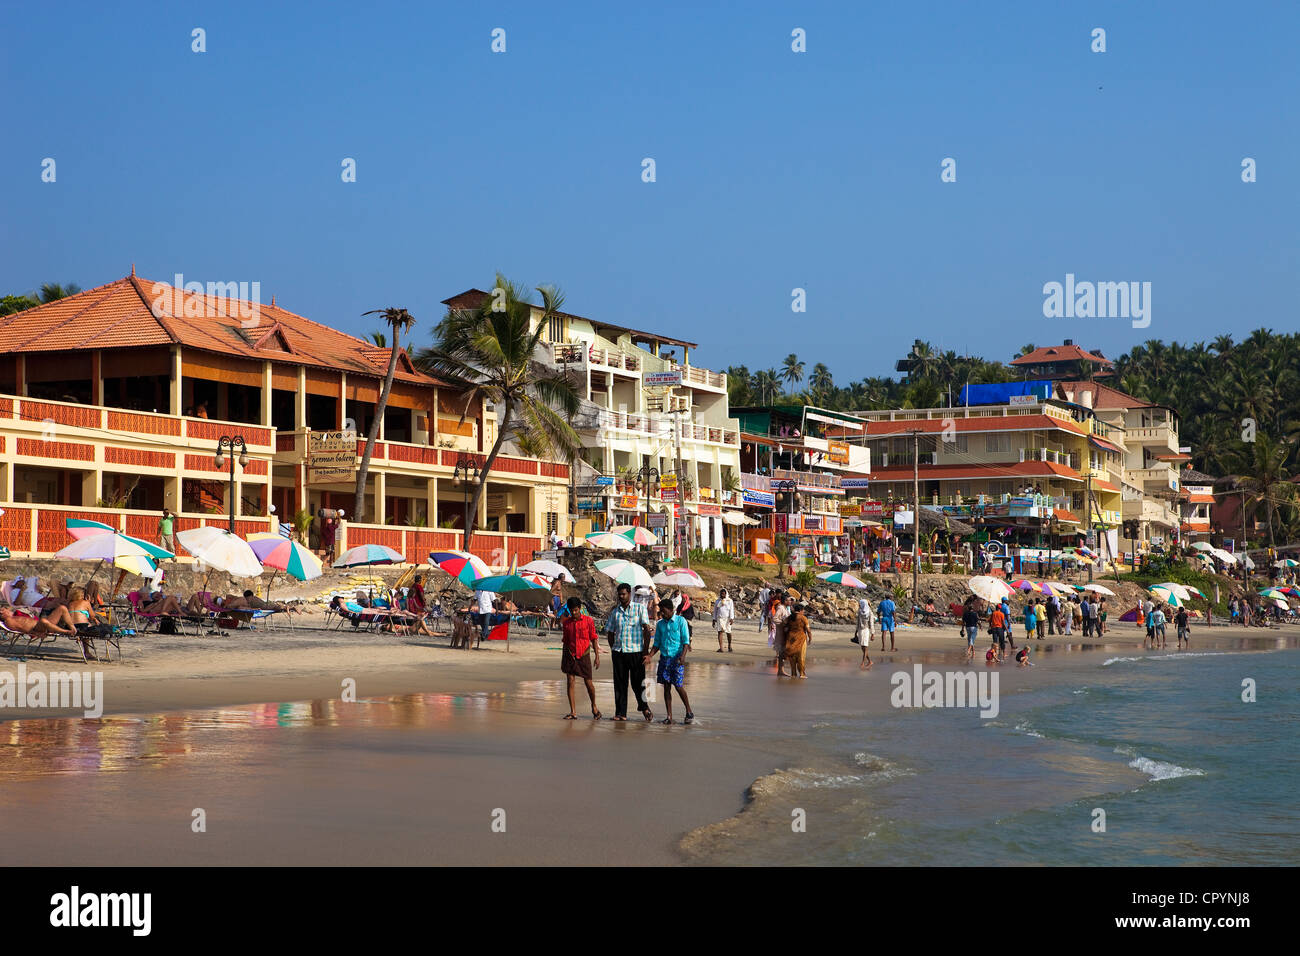 India, Kerala State, seaside resort of Kovalam - Stock Image